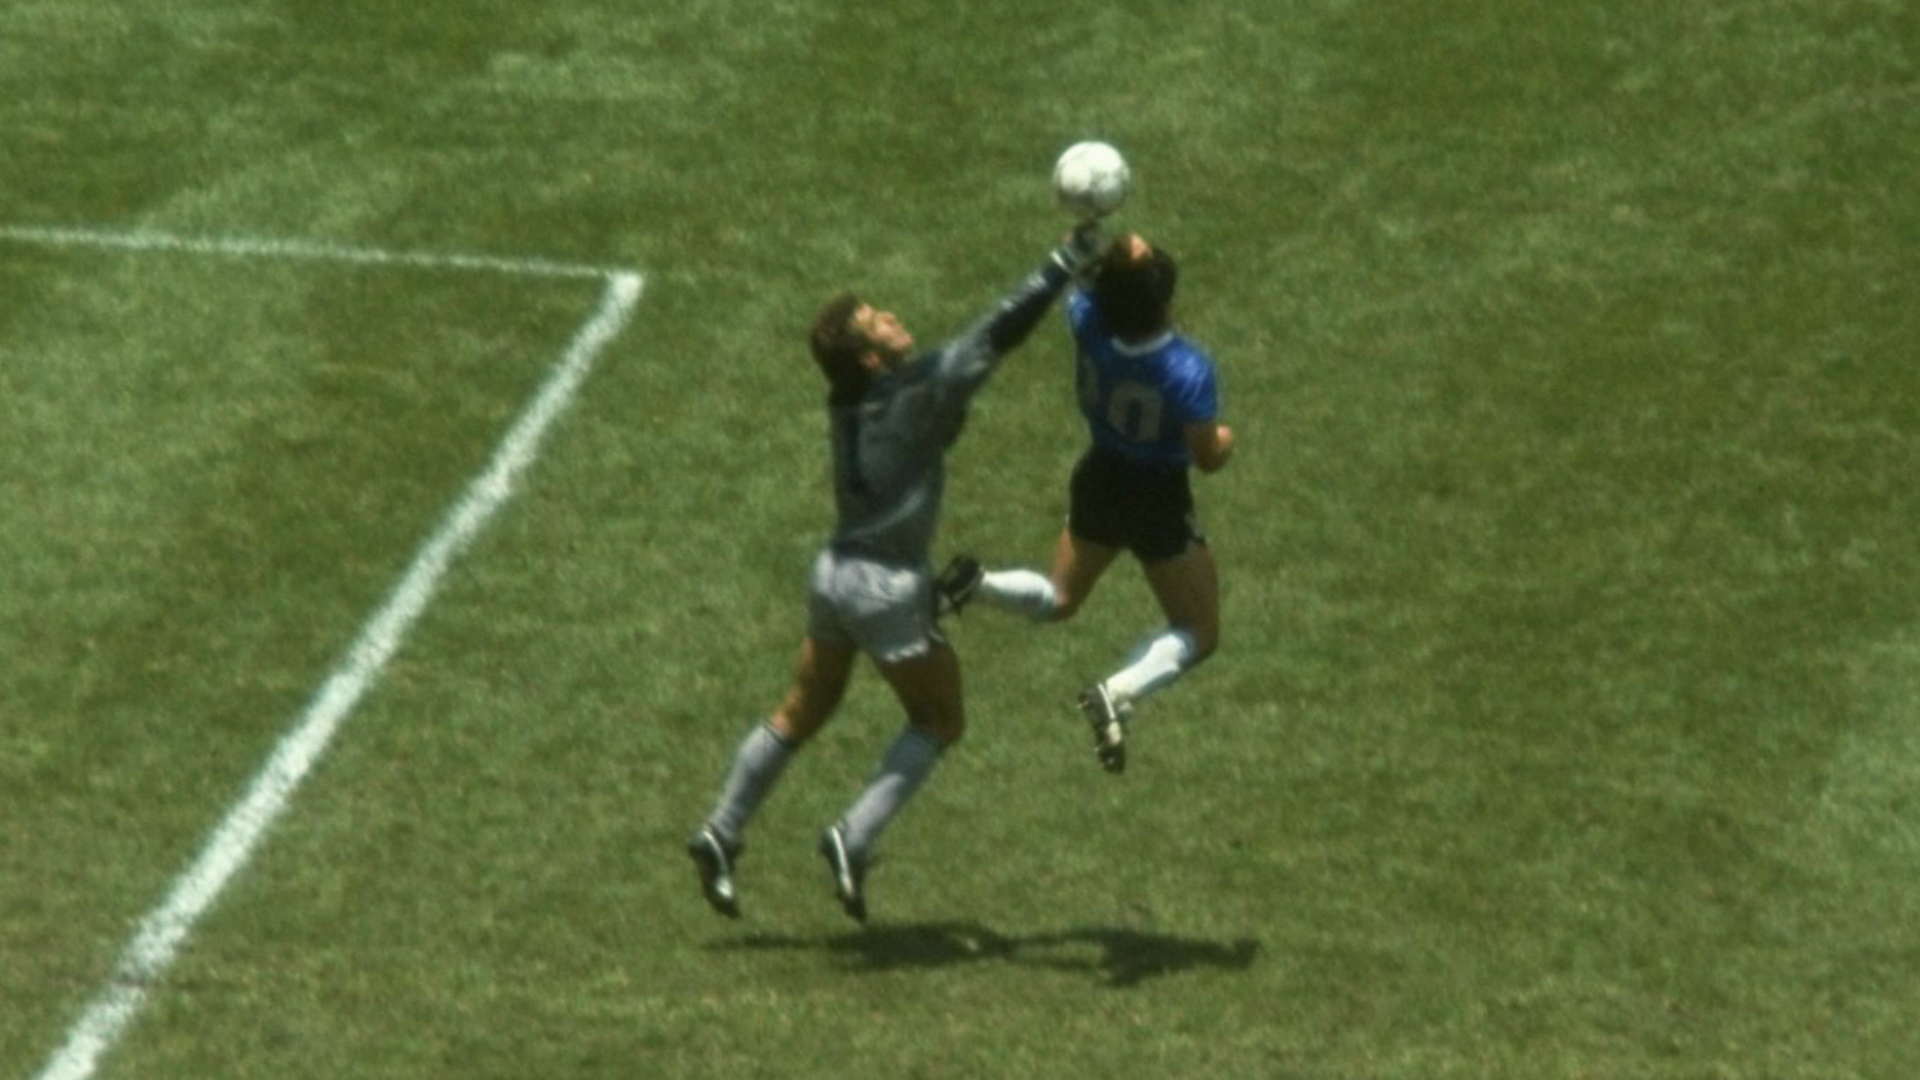 'Maradona had greatness in him but no sportsmanship' – England legend Shilton can't forgive 'Hand of God'